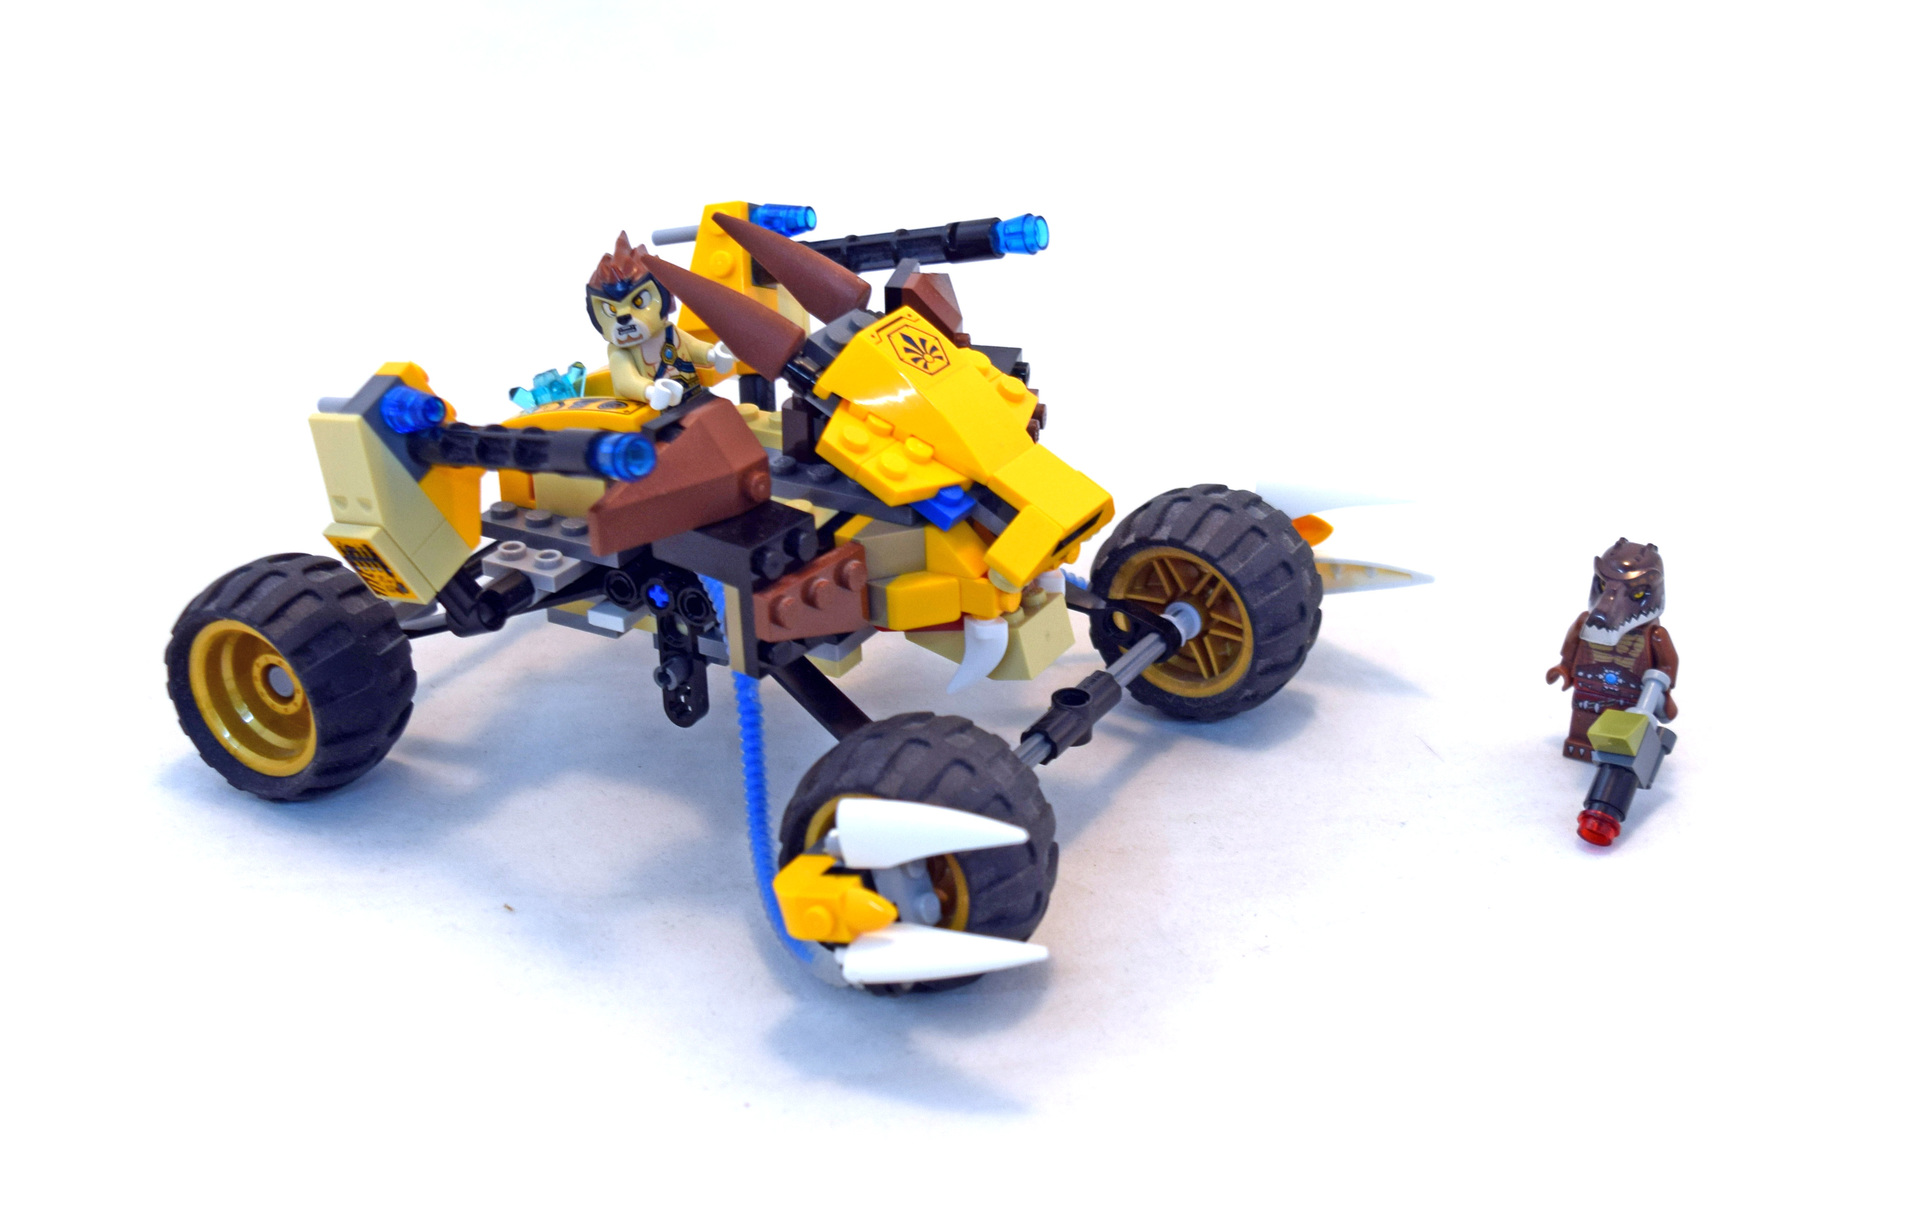 Lego Legends Of Chima Lennox Minifigure From Set 70002 Lennox/' Lion Attack